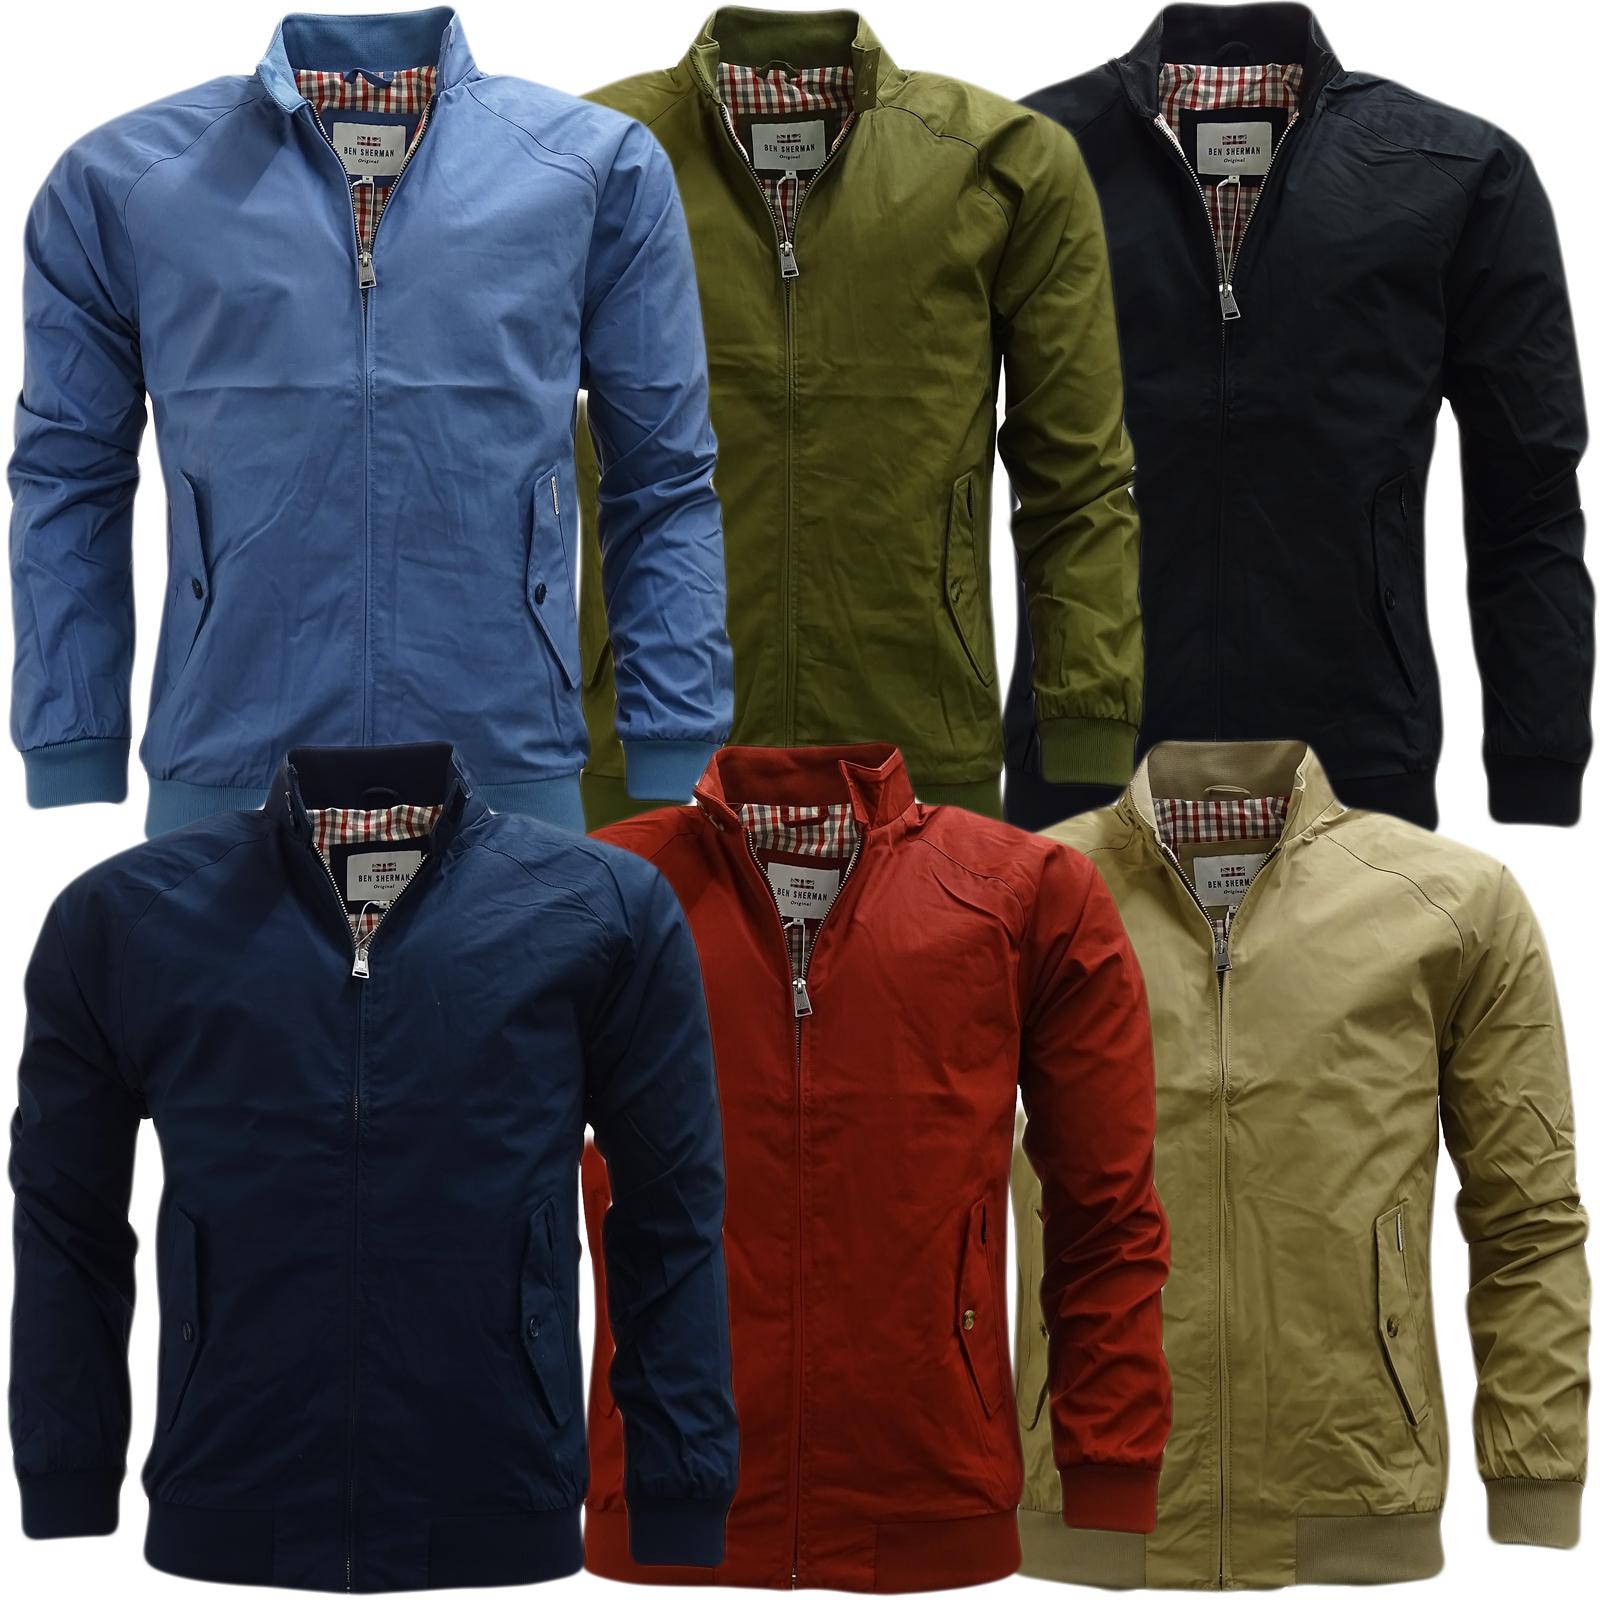 Ben Sherman Lightweight Harrington Coat With Gingham Lining Jacket 47822